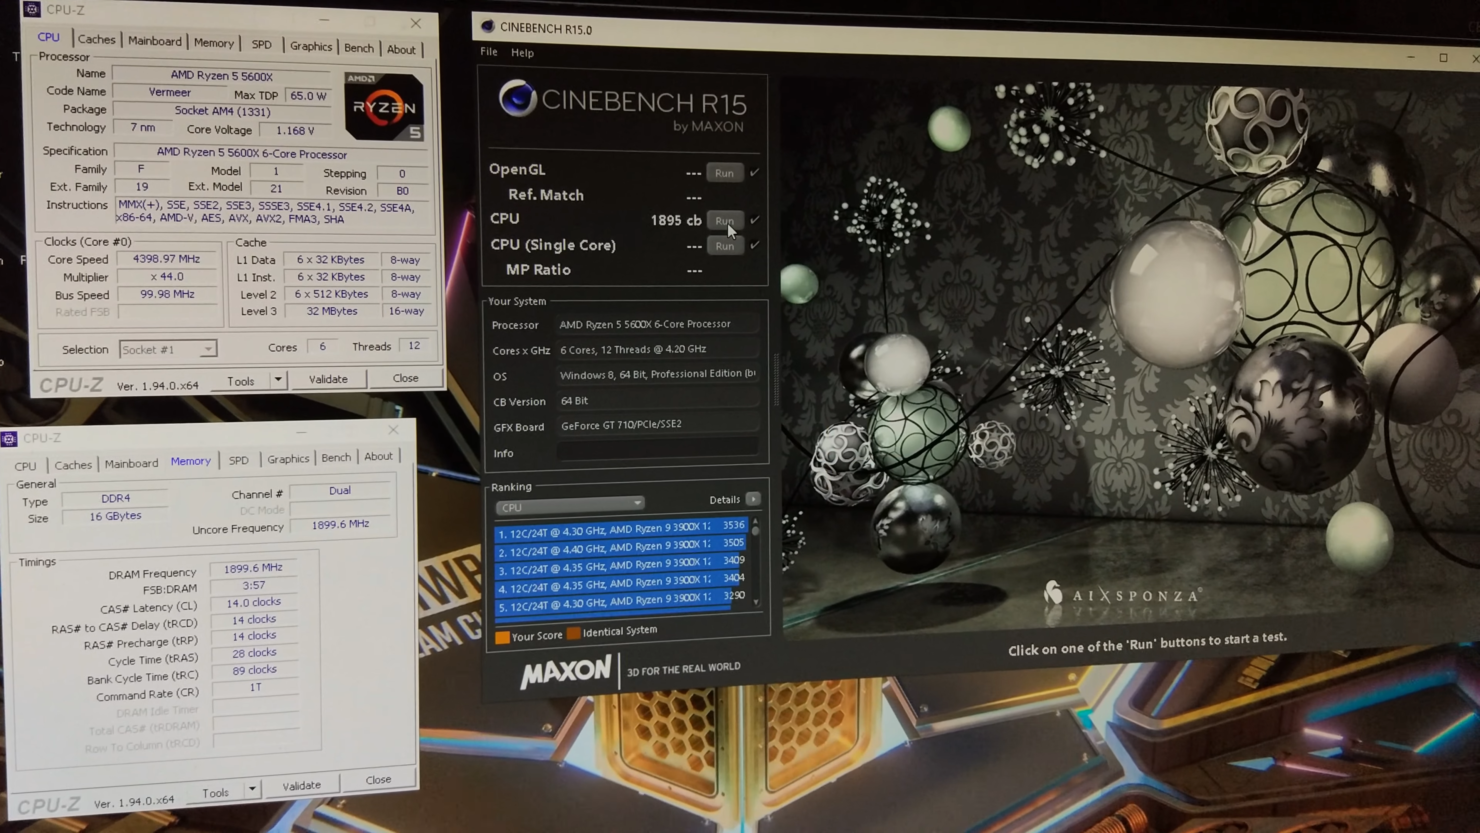 amd-ryzen-5-5600x-6-core-zen-3-cpu-benchmarks_4-4-ghz_1